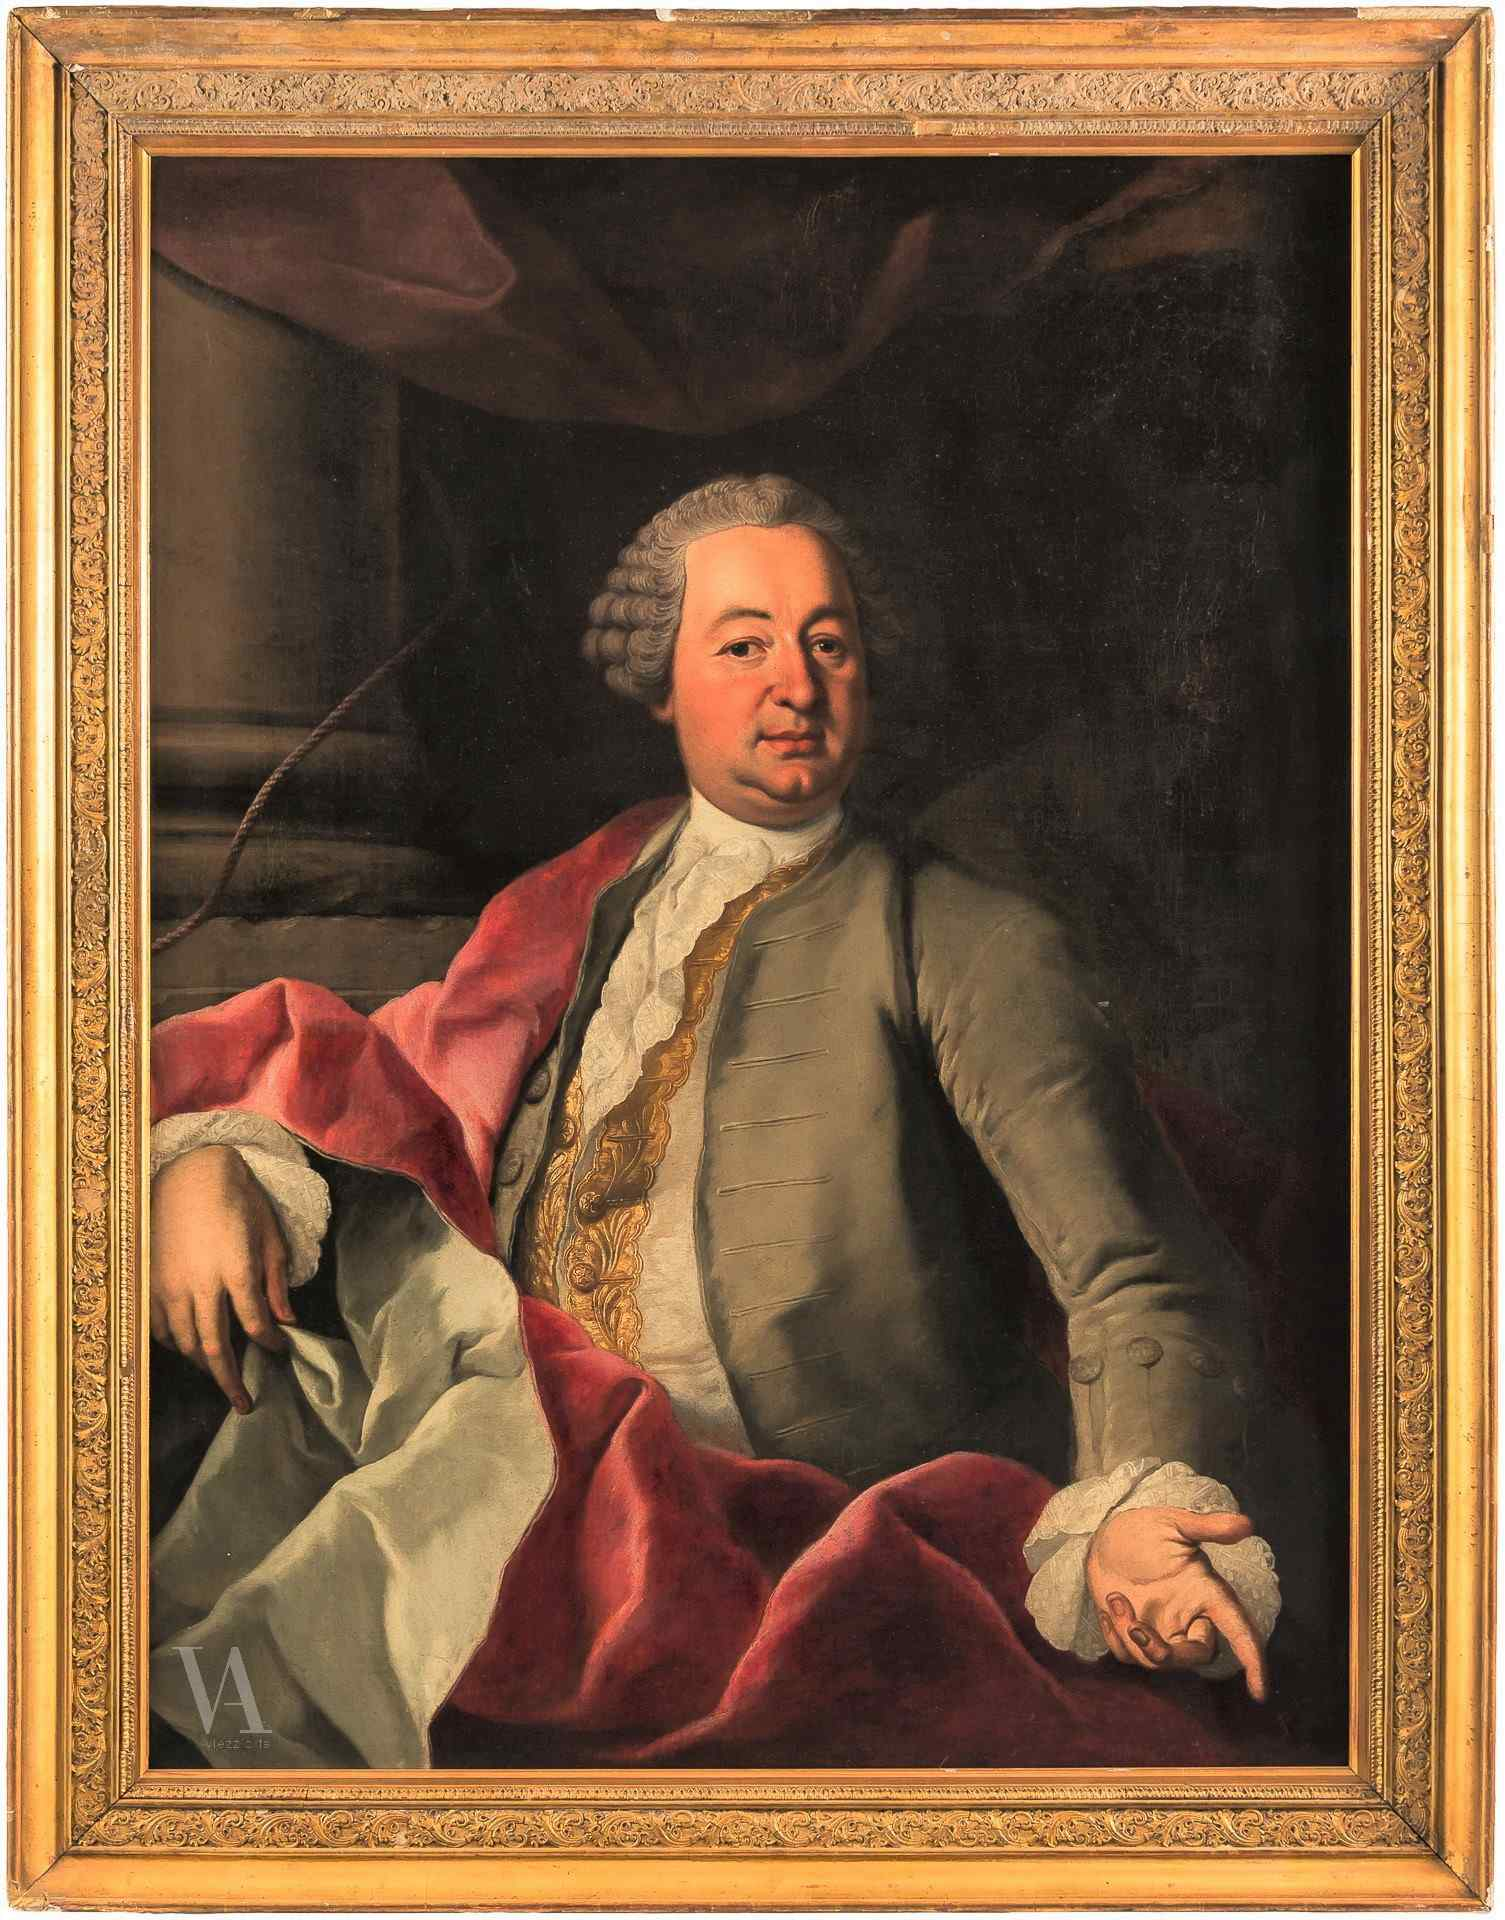 Neapolitan master of the eighteenth century, Portrait of a n